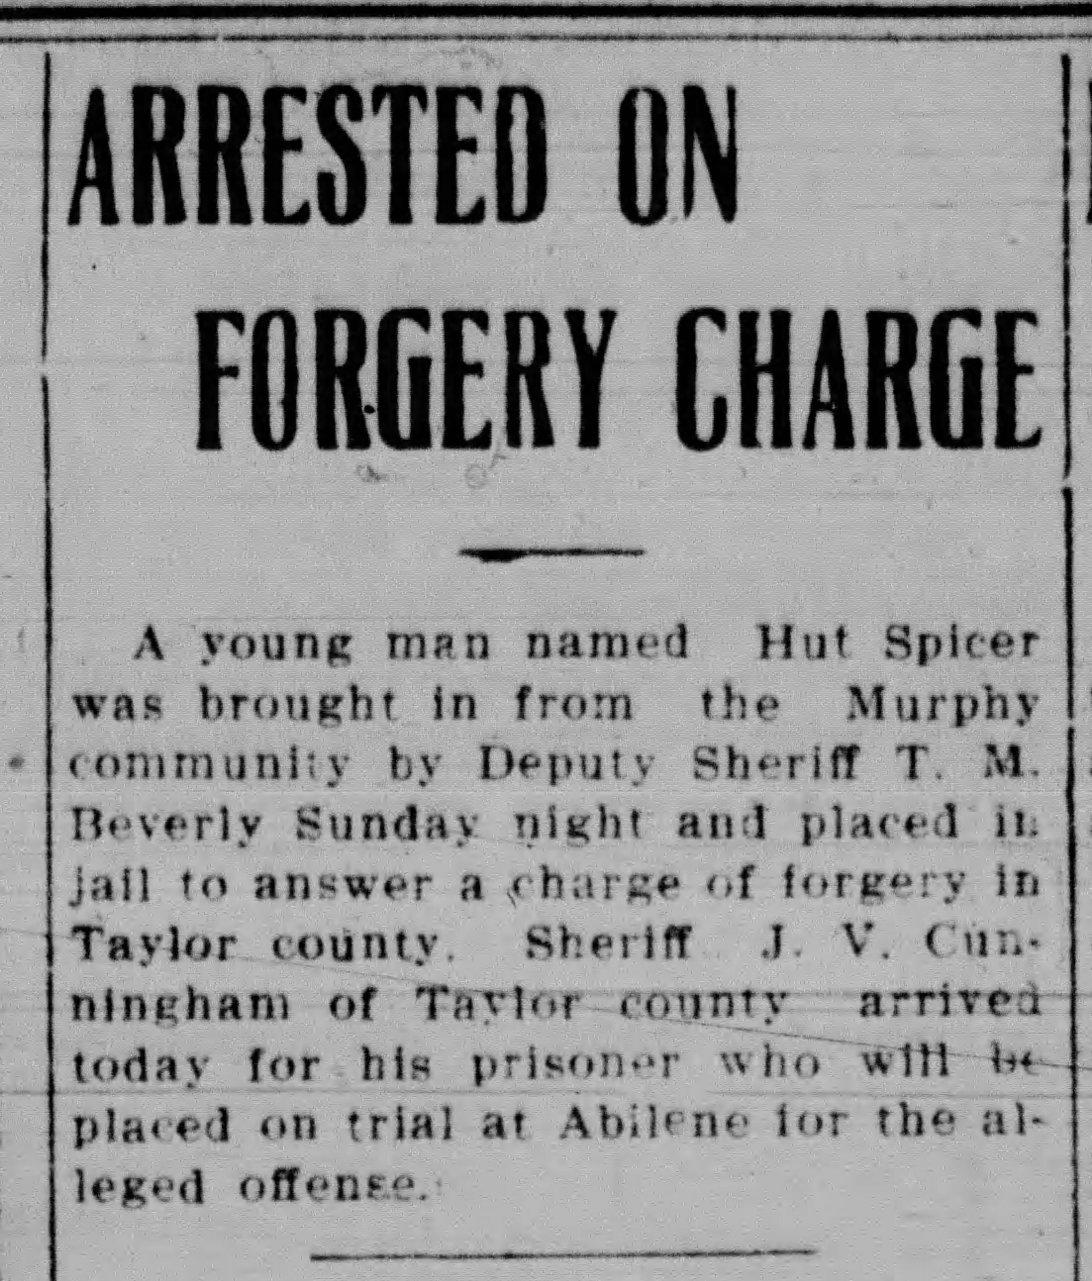 Forgery The_Courier_Gazette_Mon__Jan_21__1907_